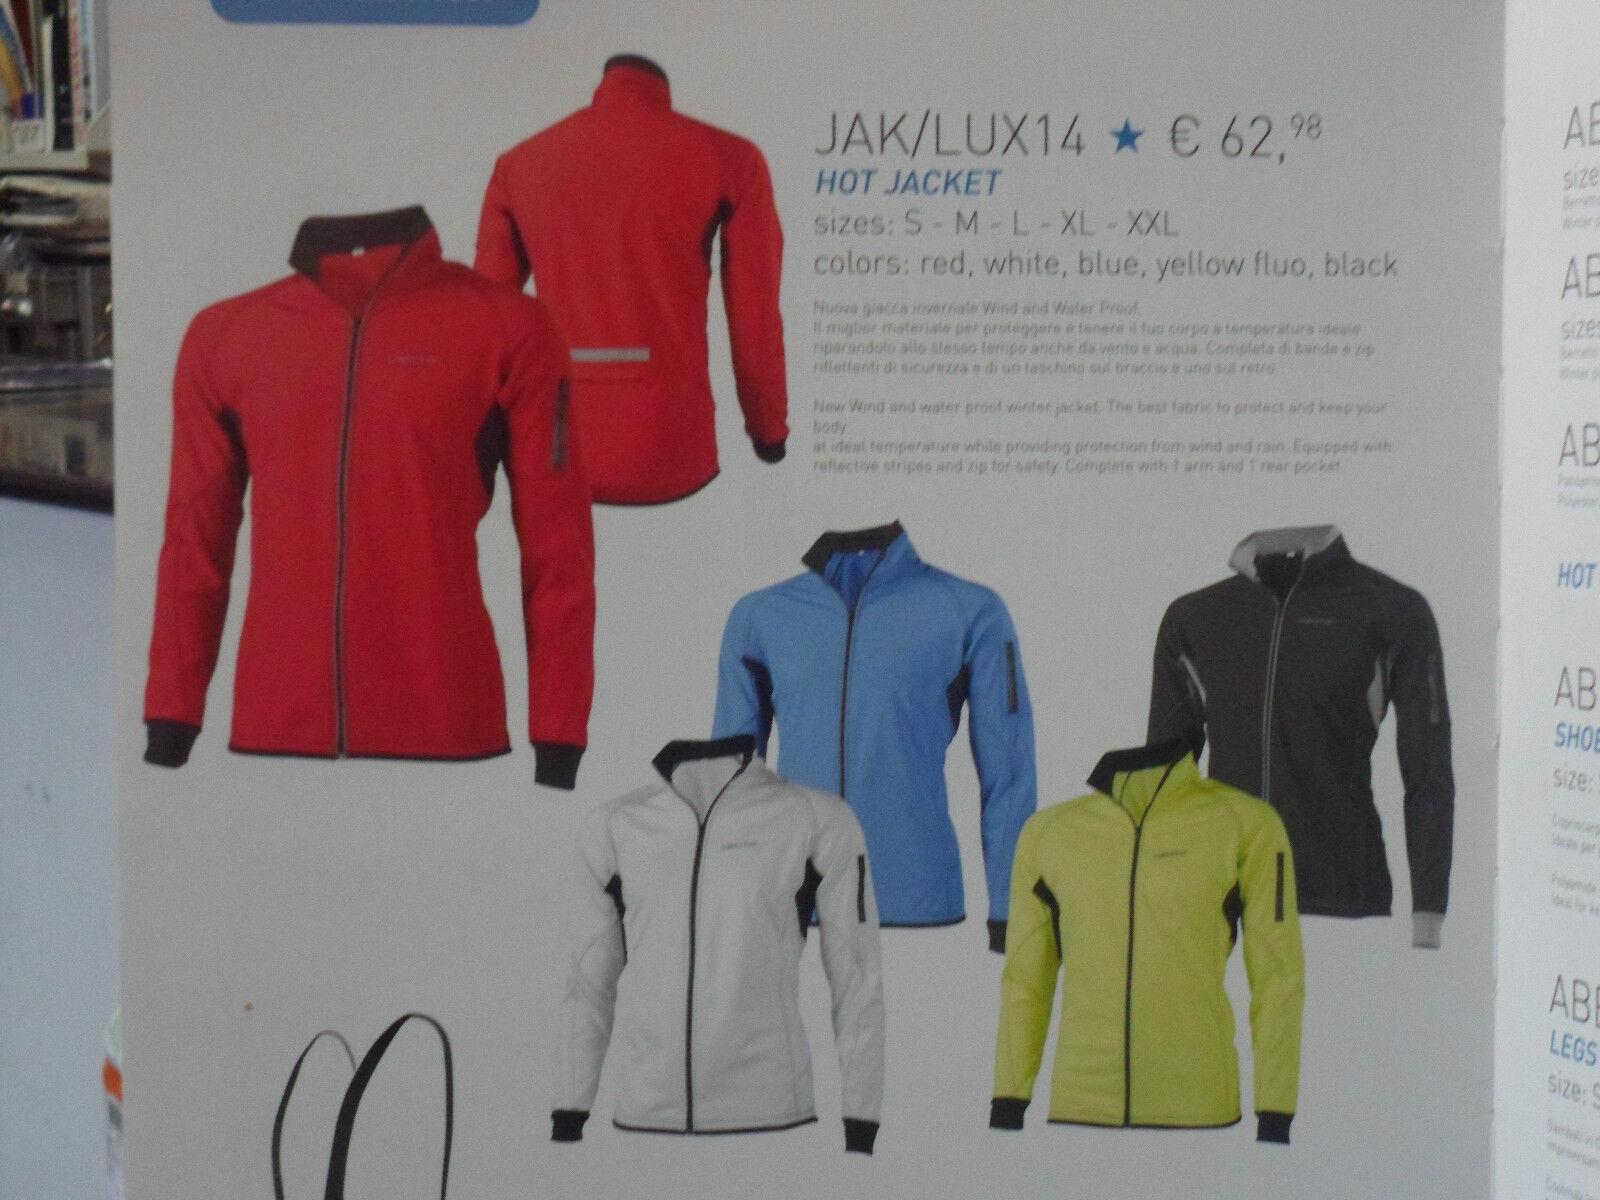 Nuova giacca invernale antivento bici ciclo mtb bike  barbieri bianca taglia s